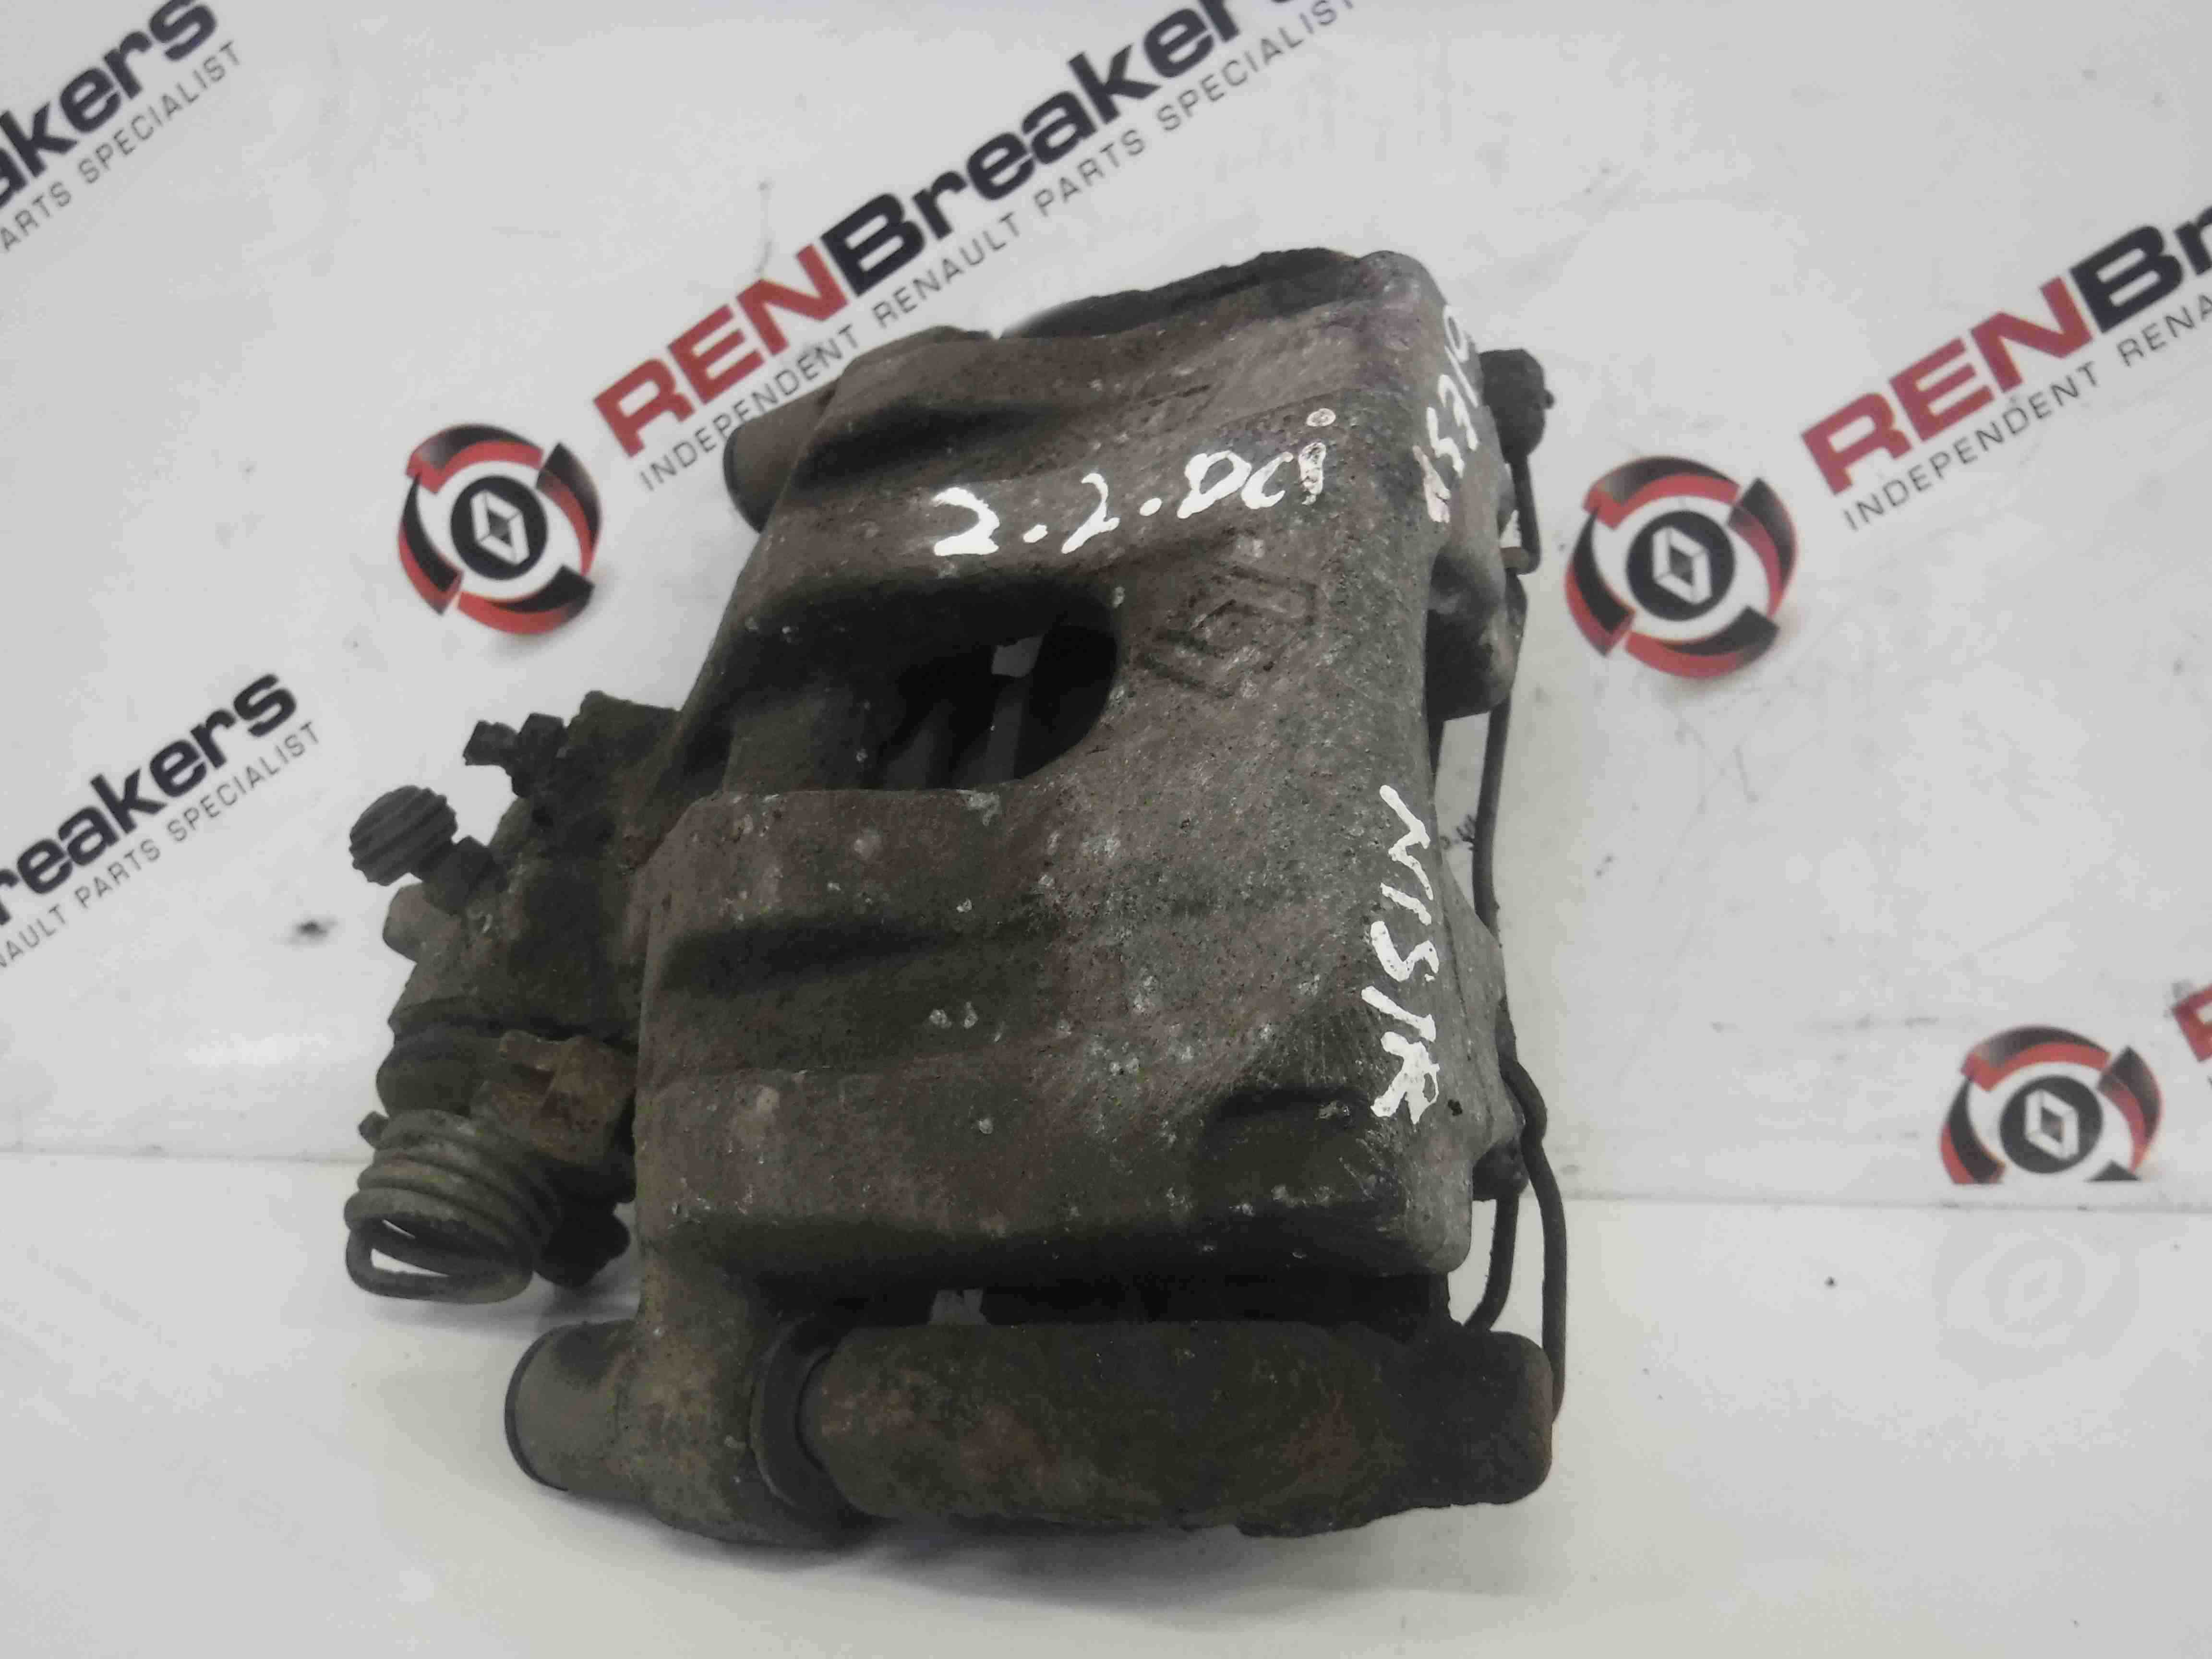 Renault Espace 2003-2013 2.2 Passenger NSR Rear Brake Caliper